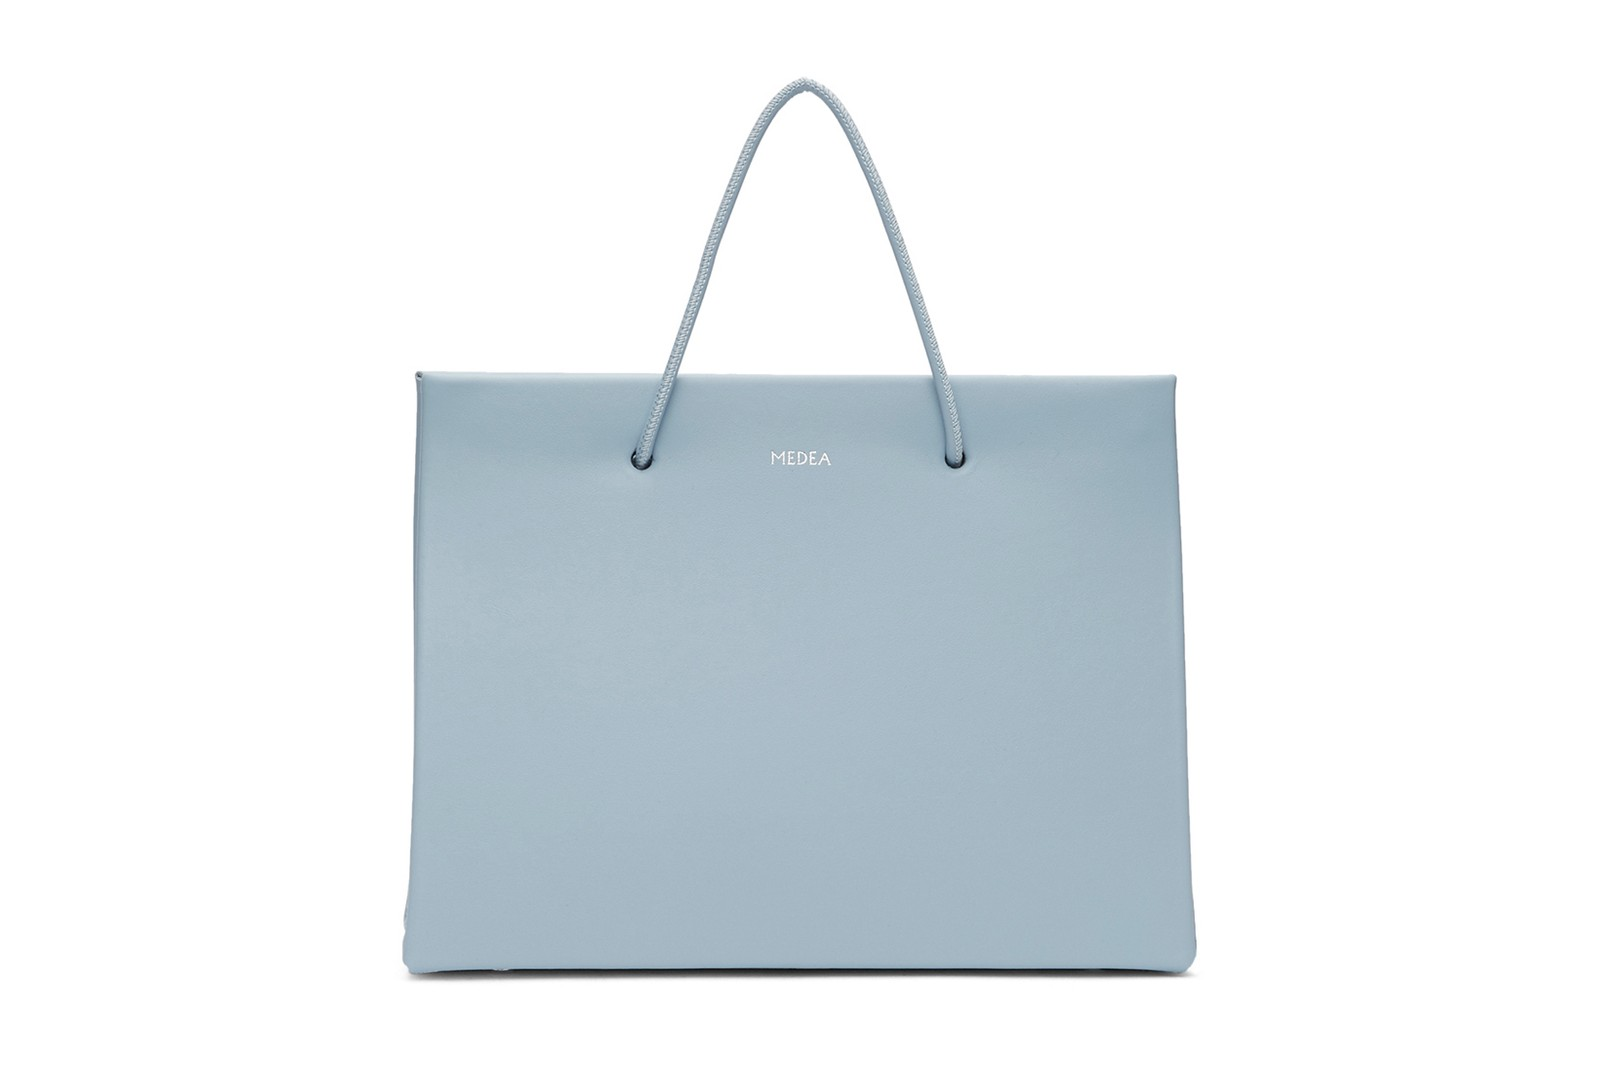 Affordable Designer Handbag Brands Medea Yuzefi Cult Gaia Manu Atelier Danse Lente